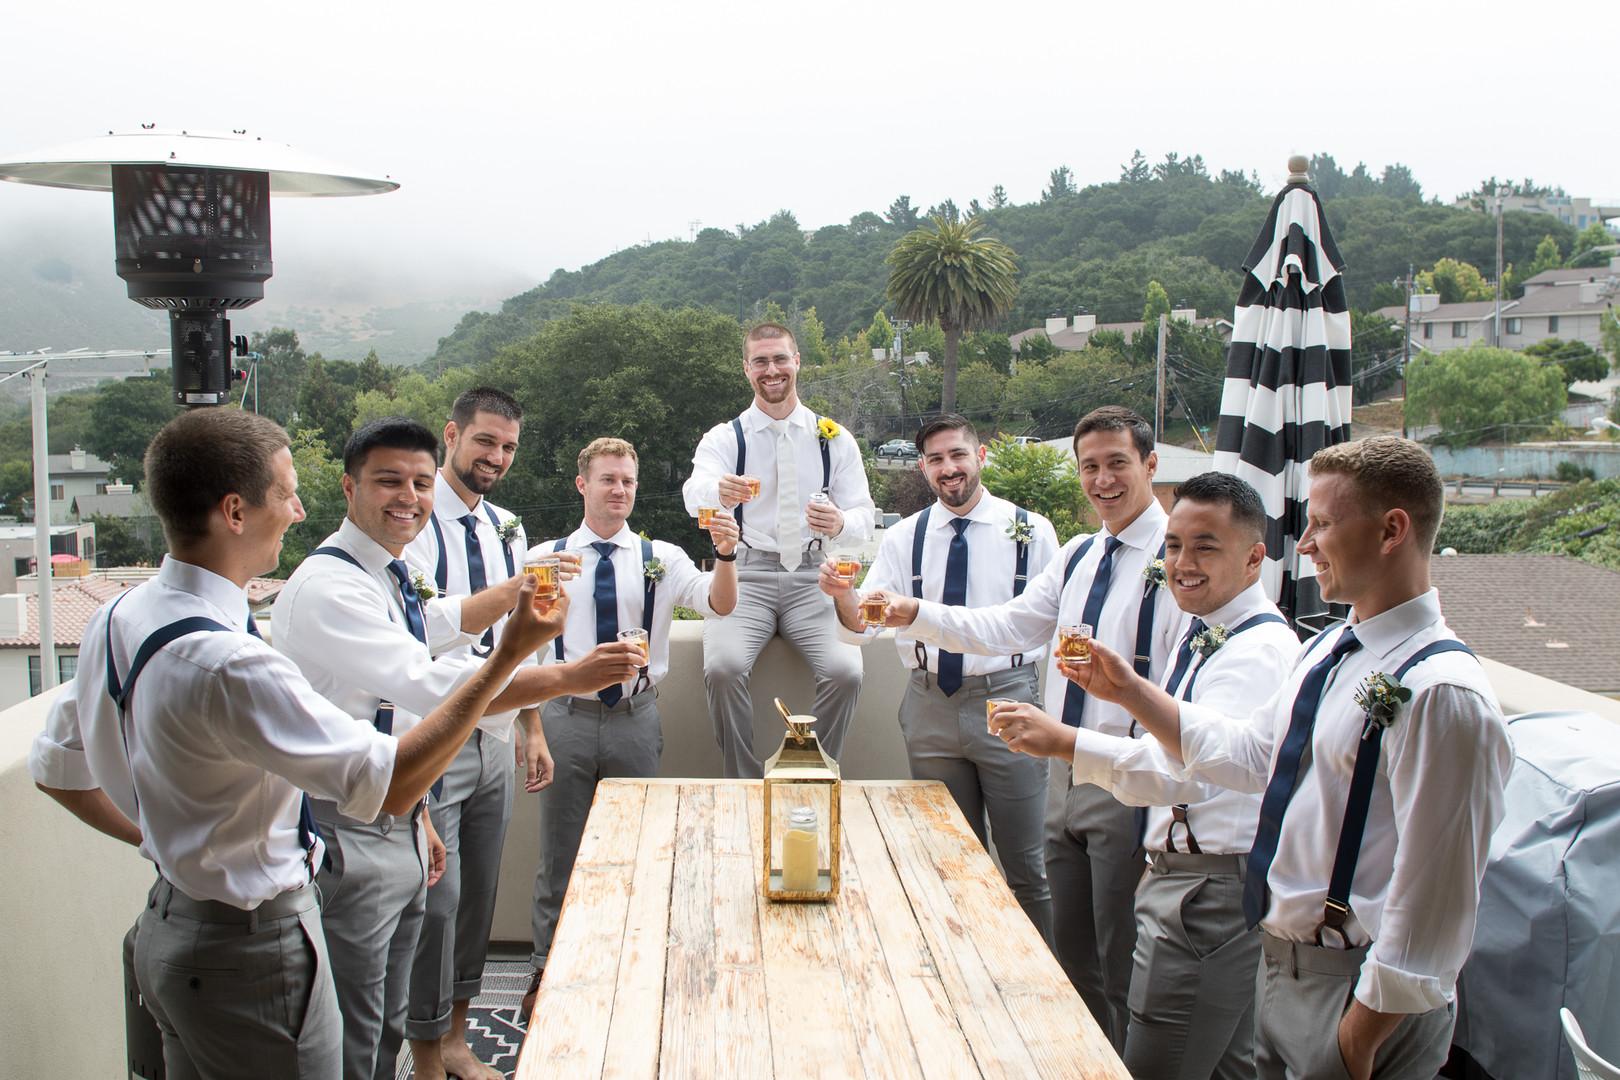 www.santabarbarawedding.com | Renoda Campbell | Weddings by Bobbie | Ventana Grill Events | Groomsmen